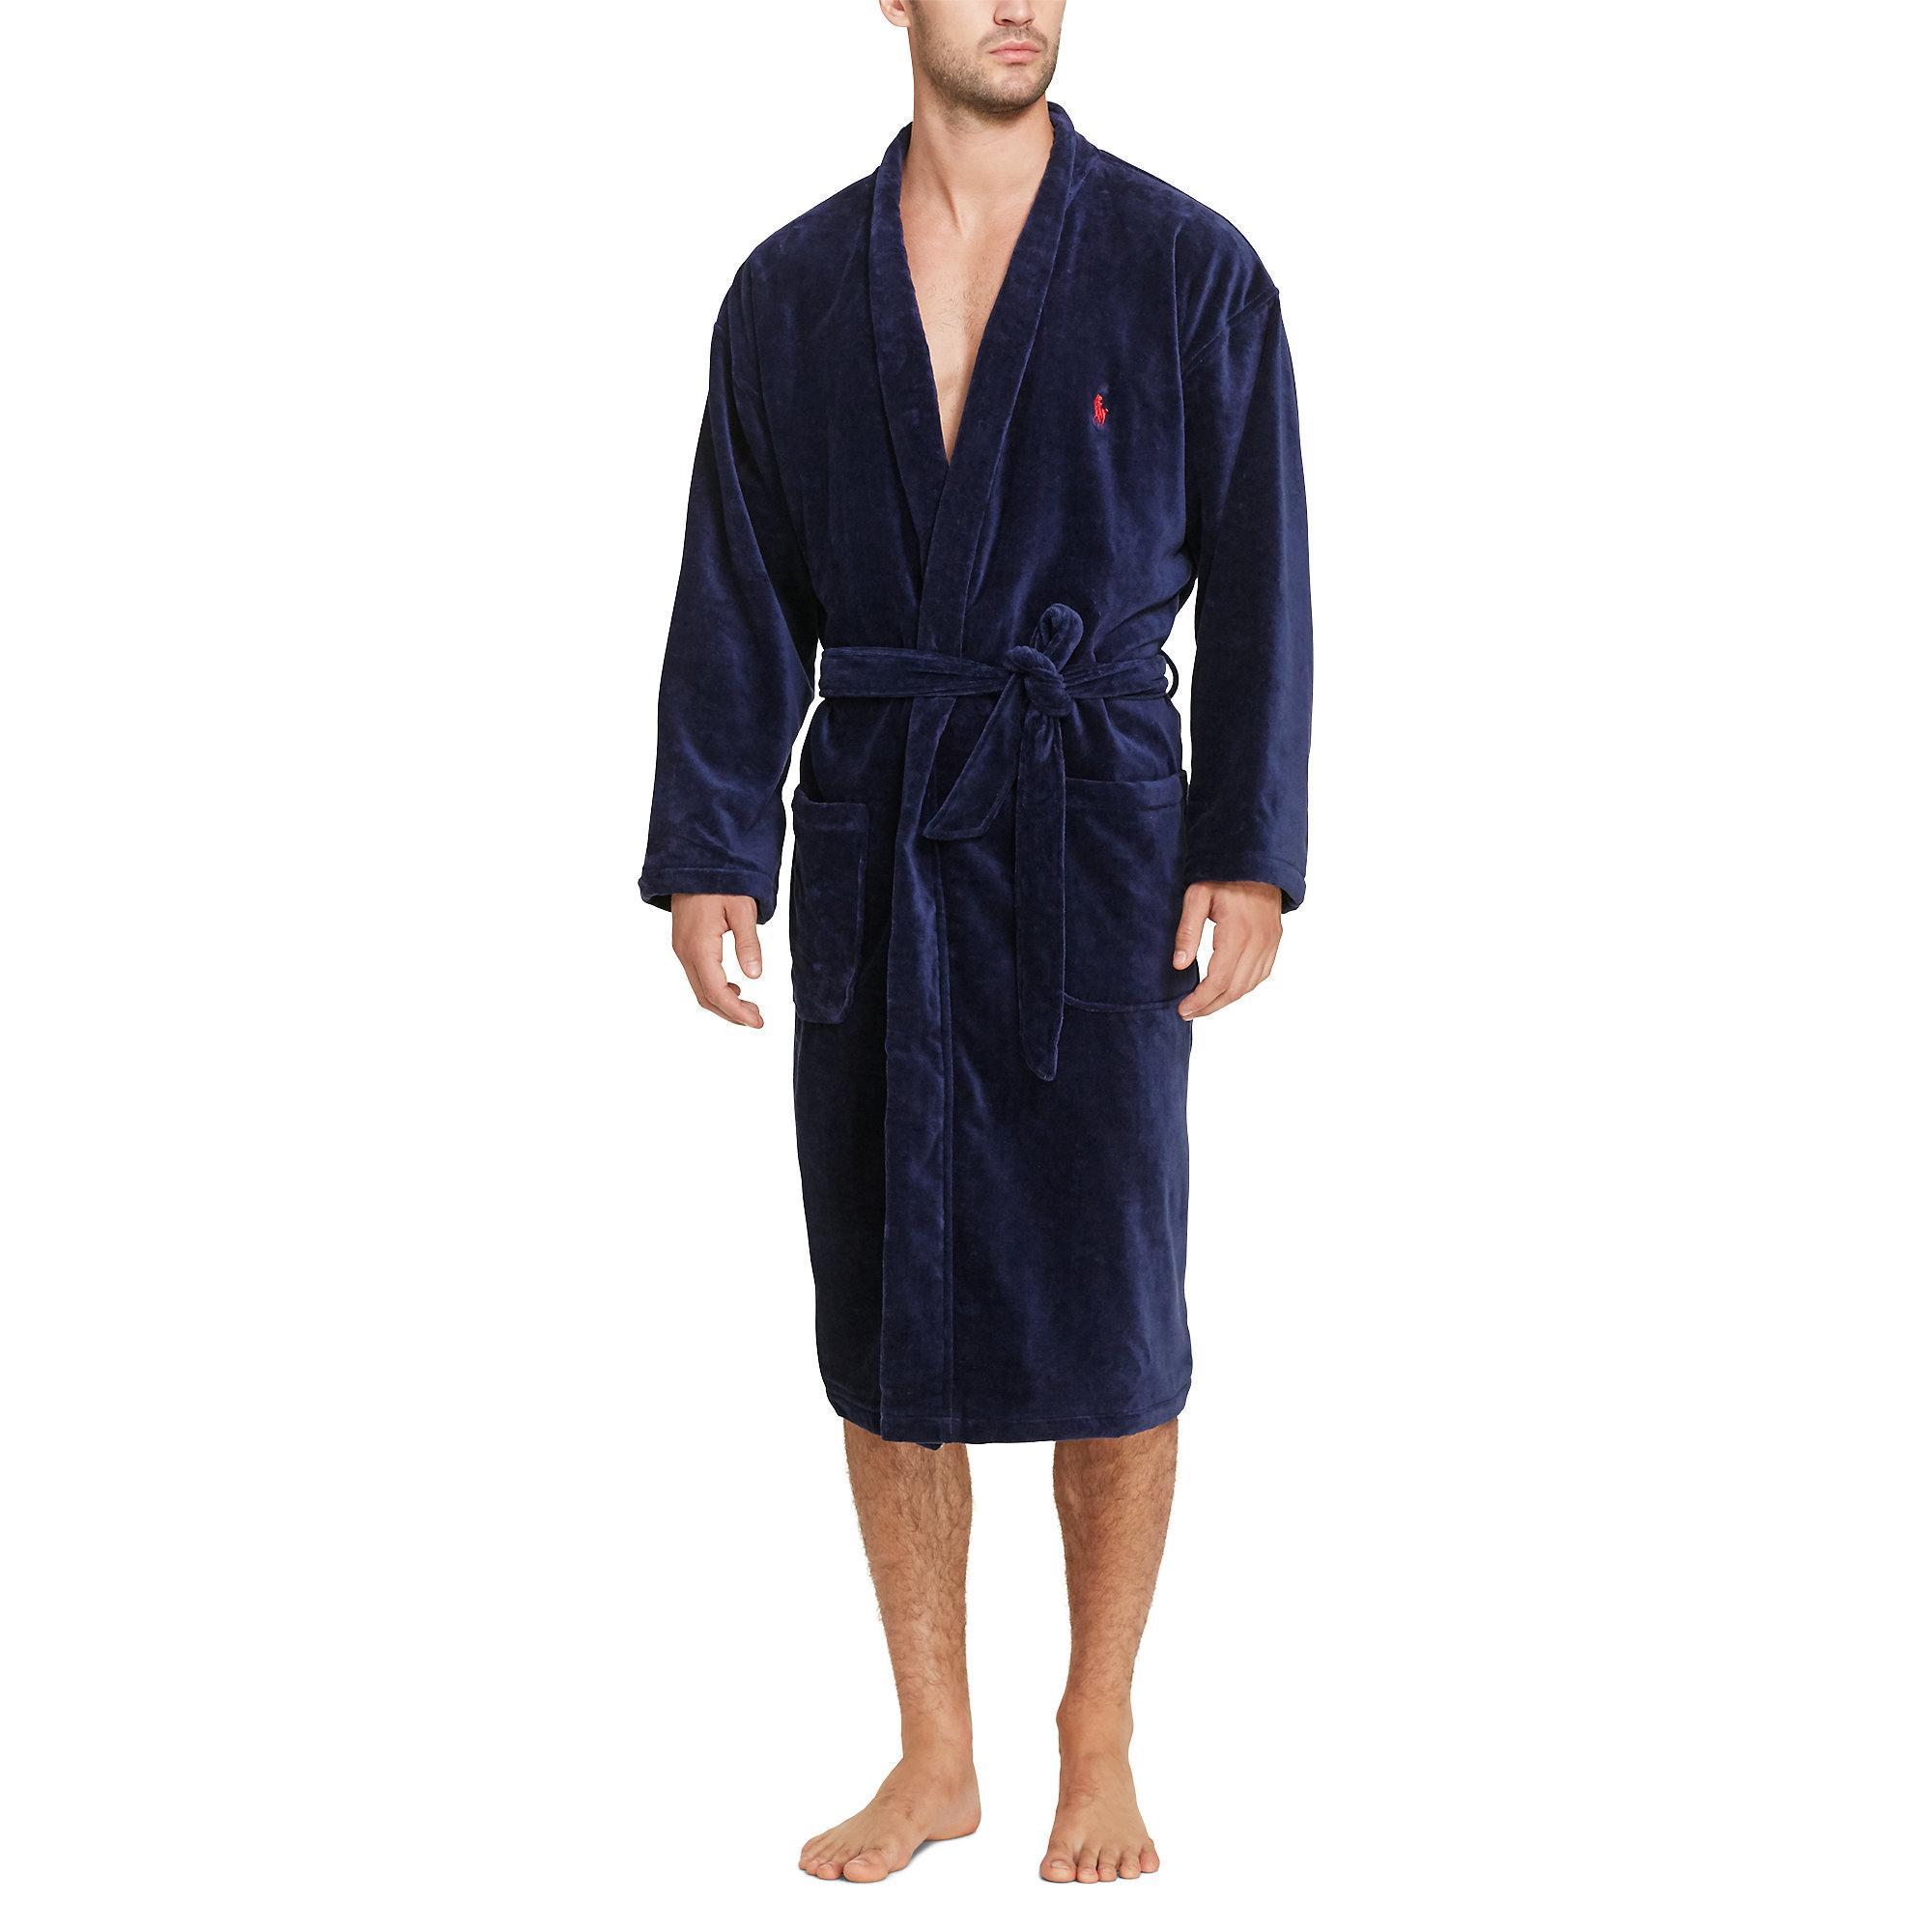 polo ralph lauren terry kimono robe in blue for men lyst. Black Bedroom Furniture Sets. Home Design Ideas